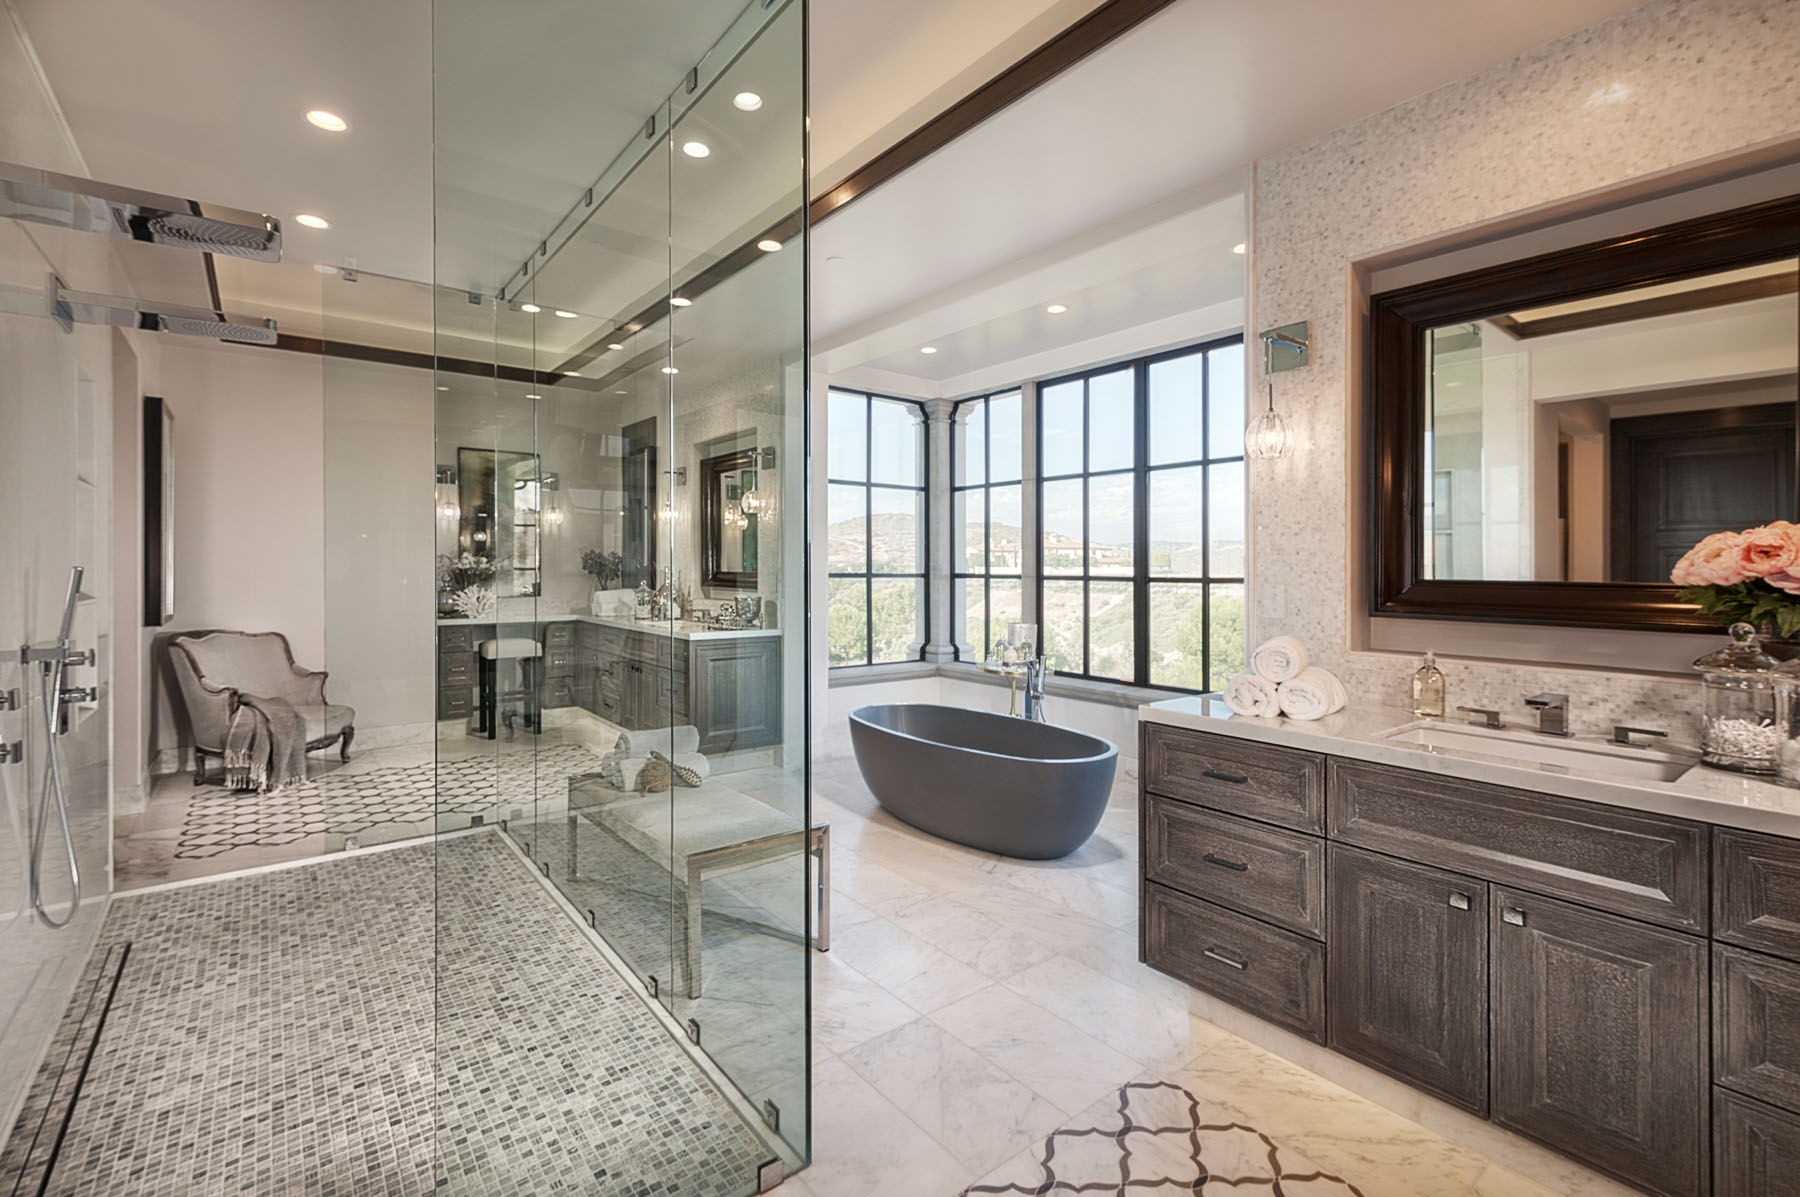 Crystal Cove - Northern Italian Villa Bathroom by Oatman Architects